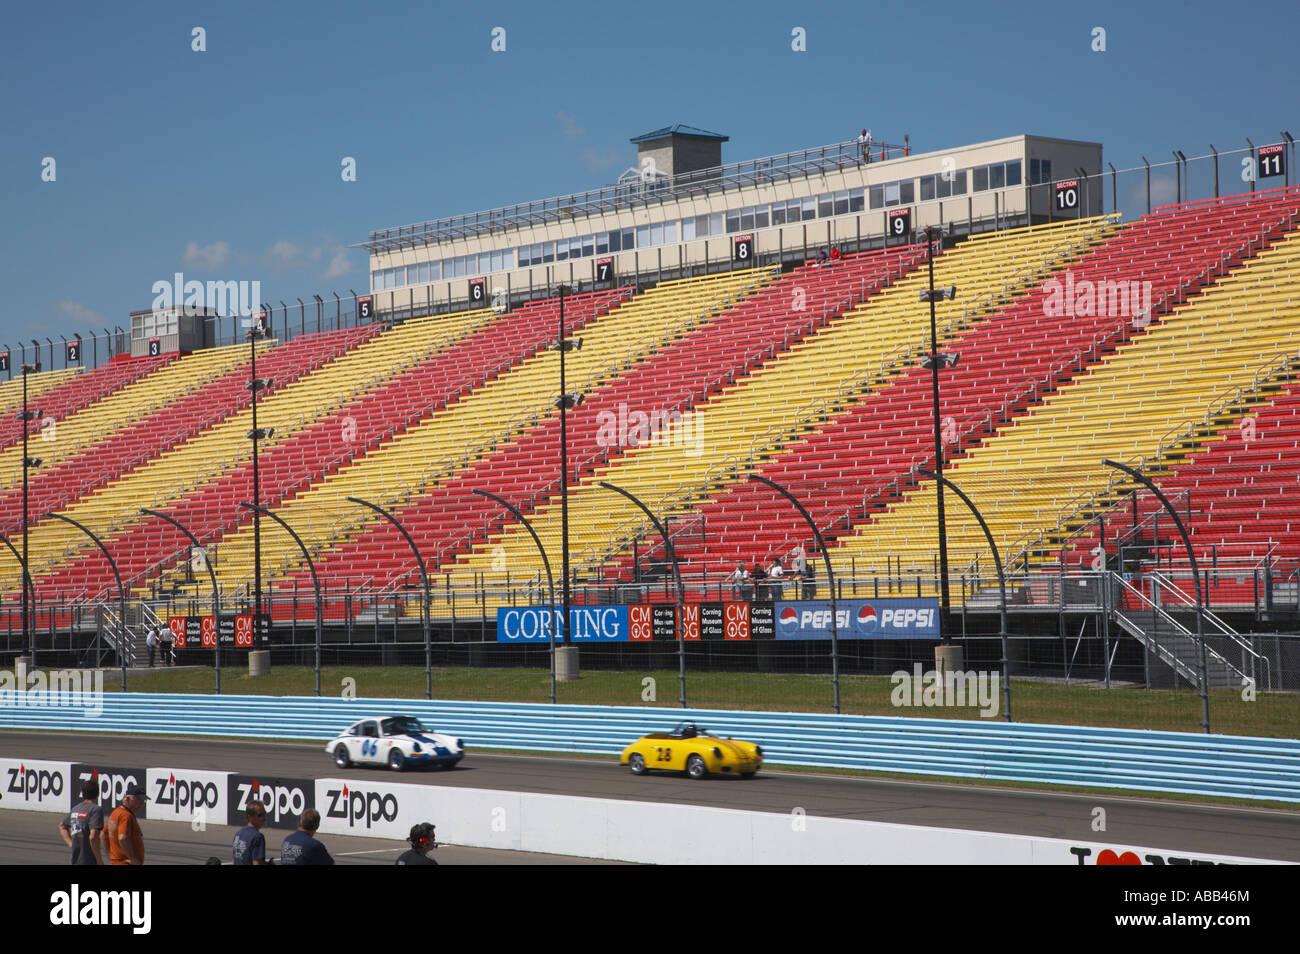 Watkins Glen Race Track >> Empty grandstands at Watkins Glen International Raceway in Watkins Stock Photo: 12837067 - Alamy